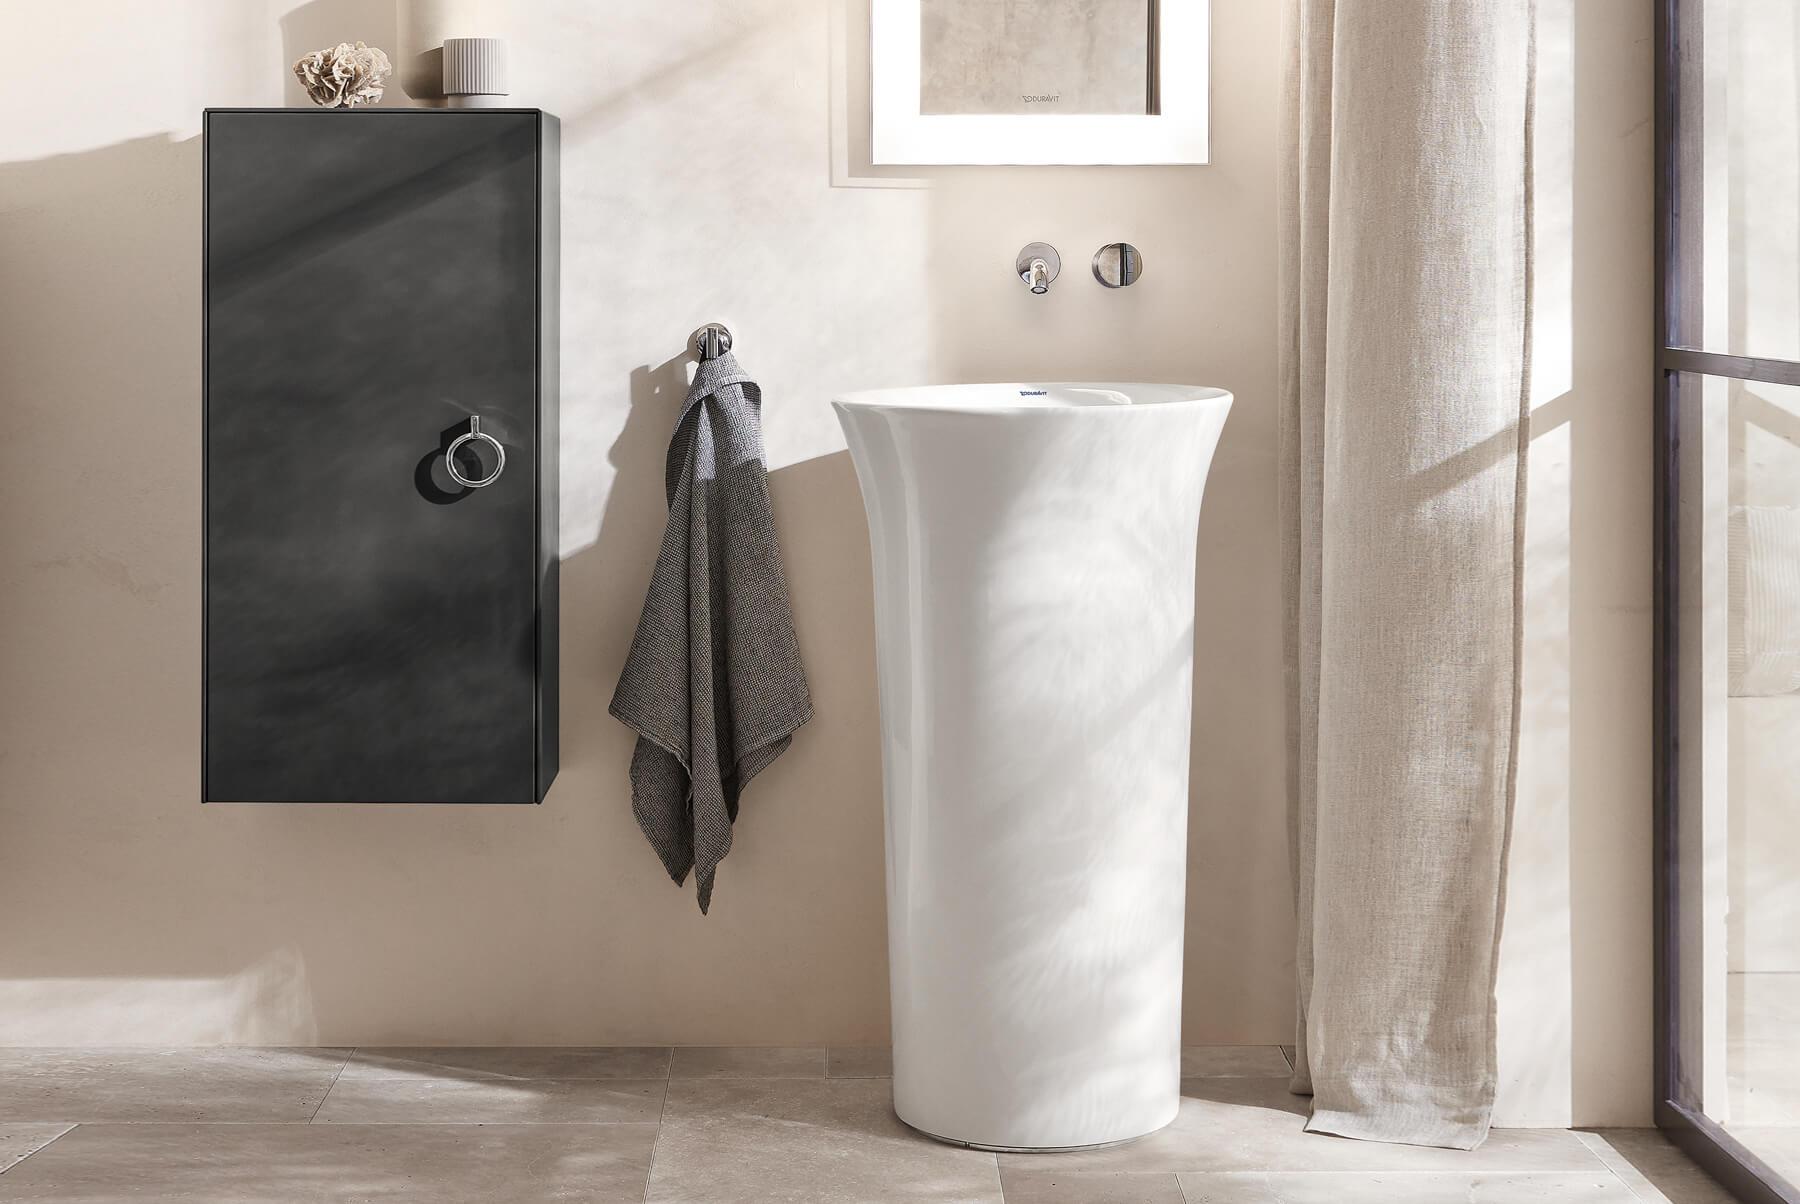 DURAVIT-White-Tulip-Freestanding-1800x1204